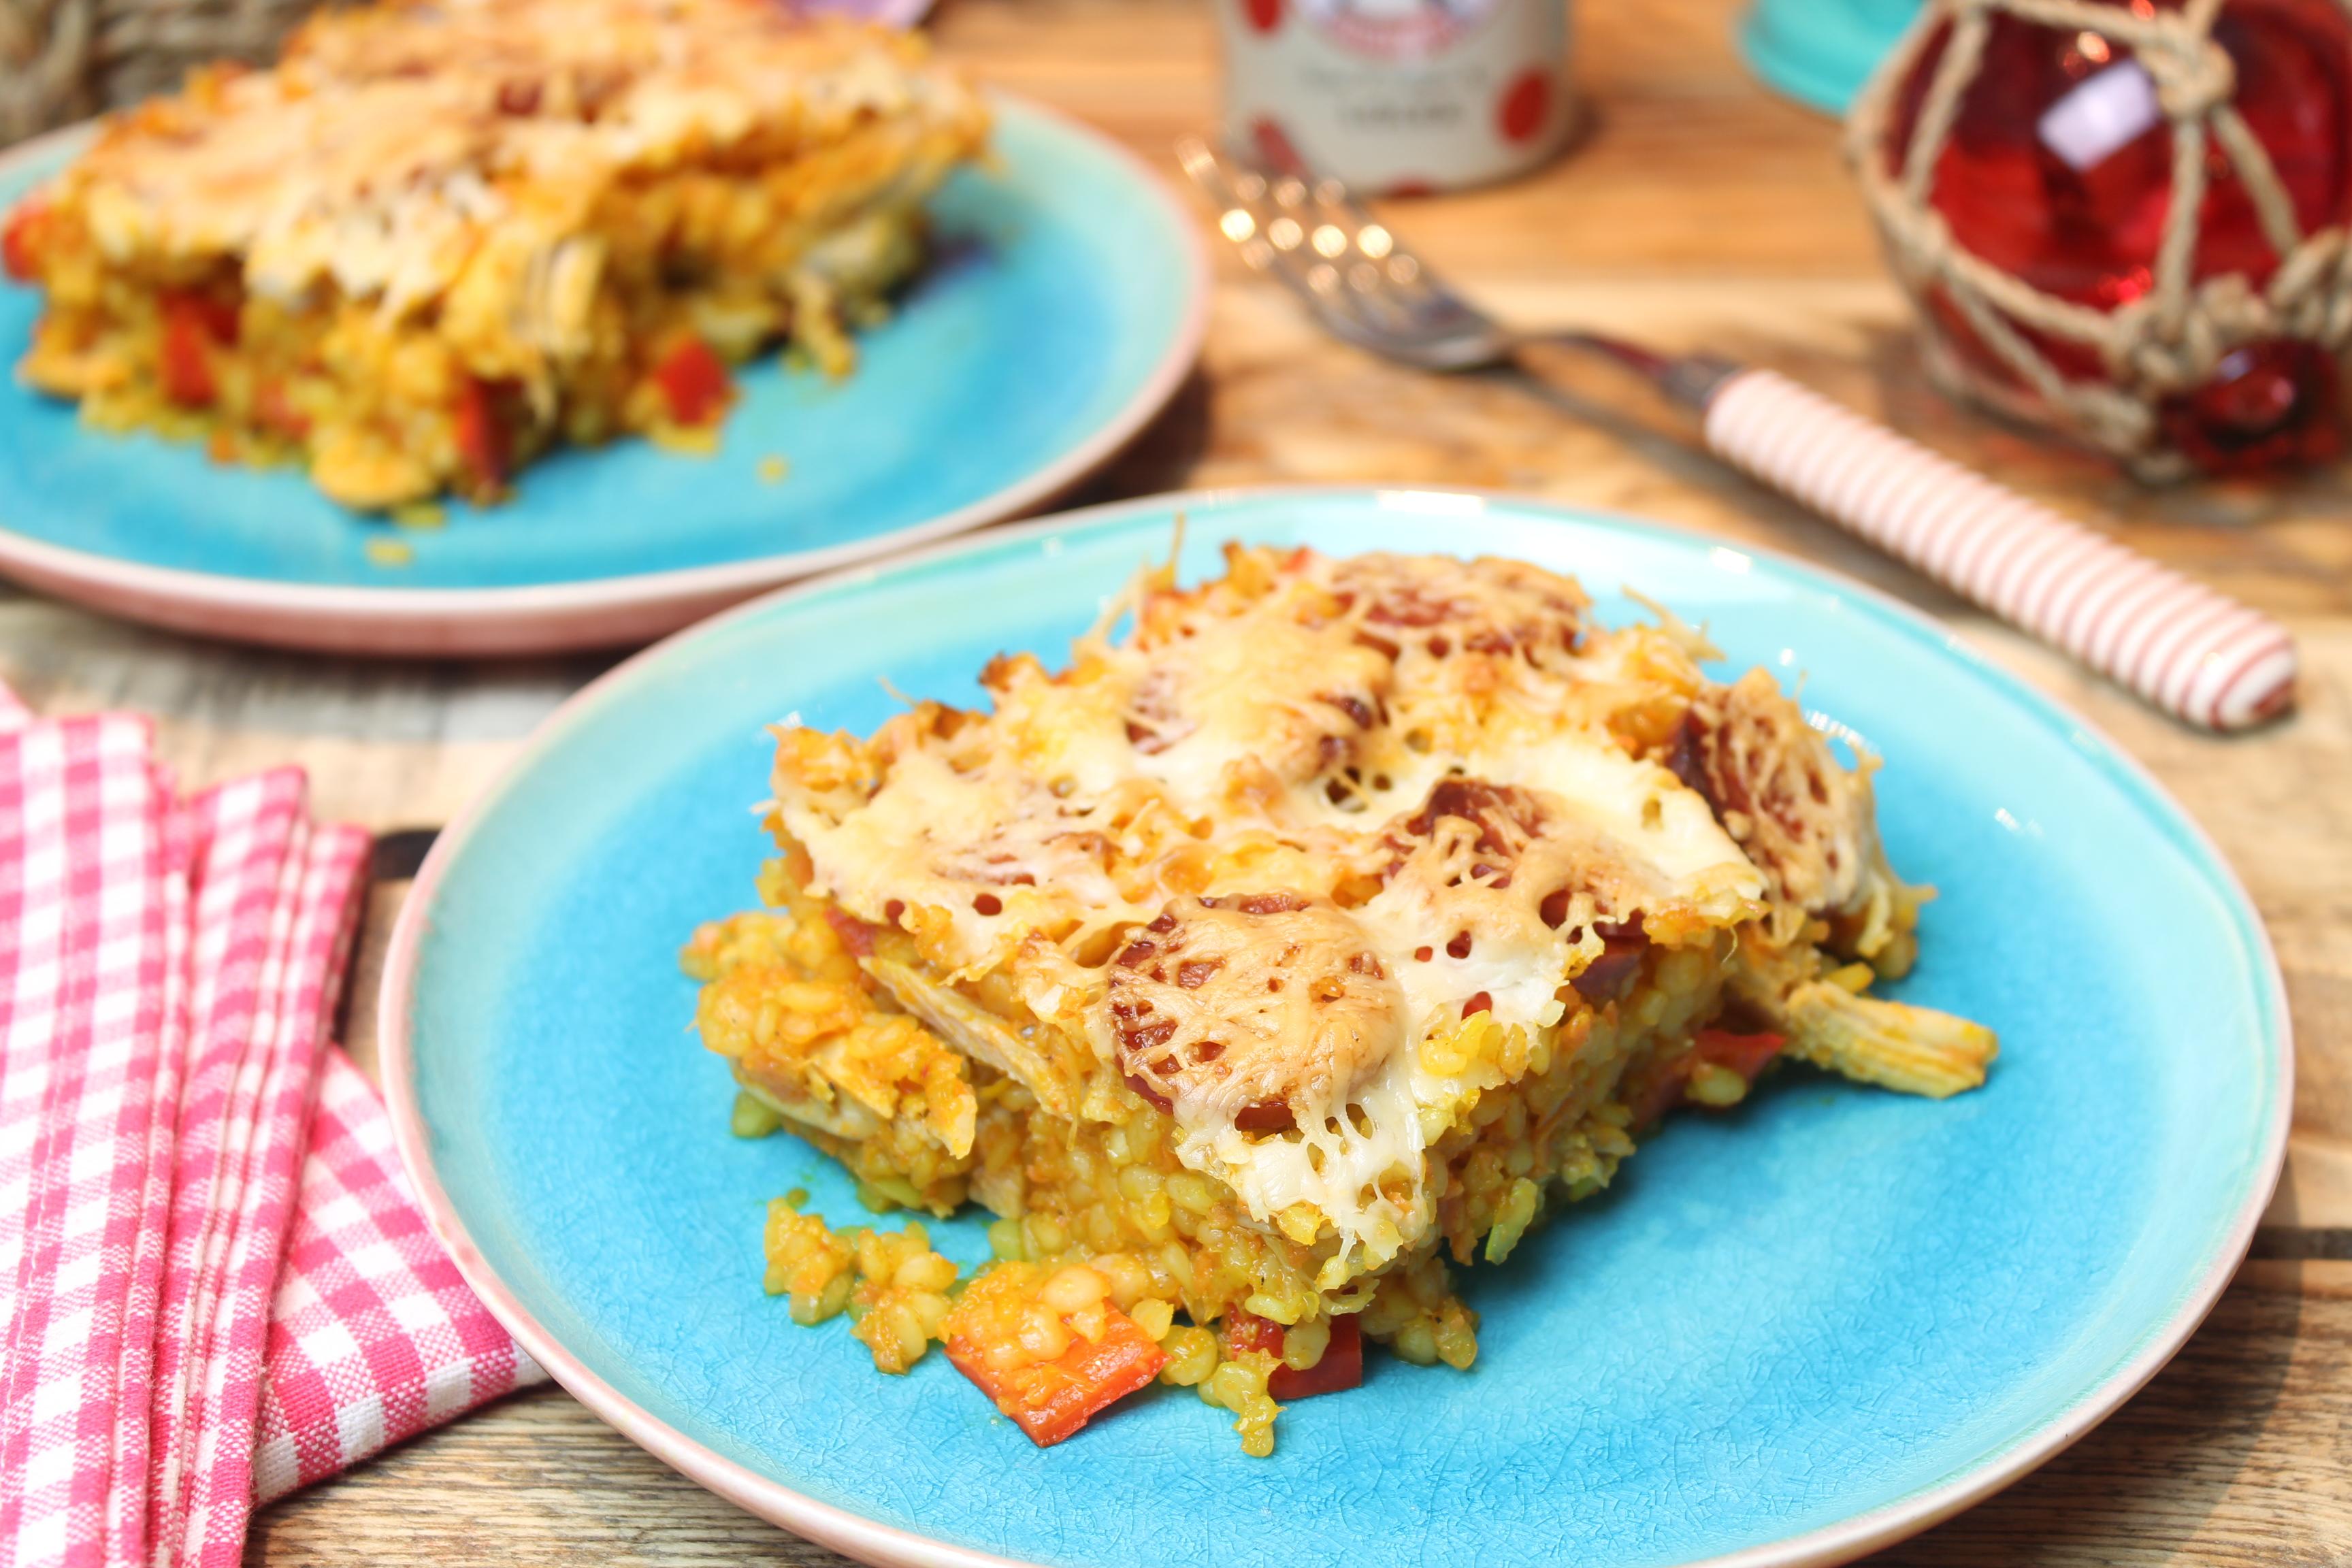 Konjak-Arroz con Pollo – Auflauf mit Konjakreis und Hühnchen